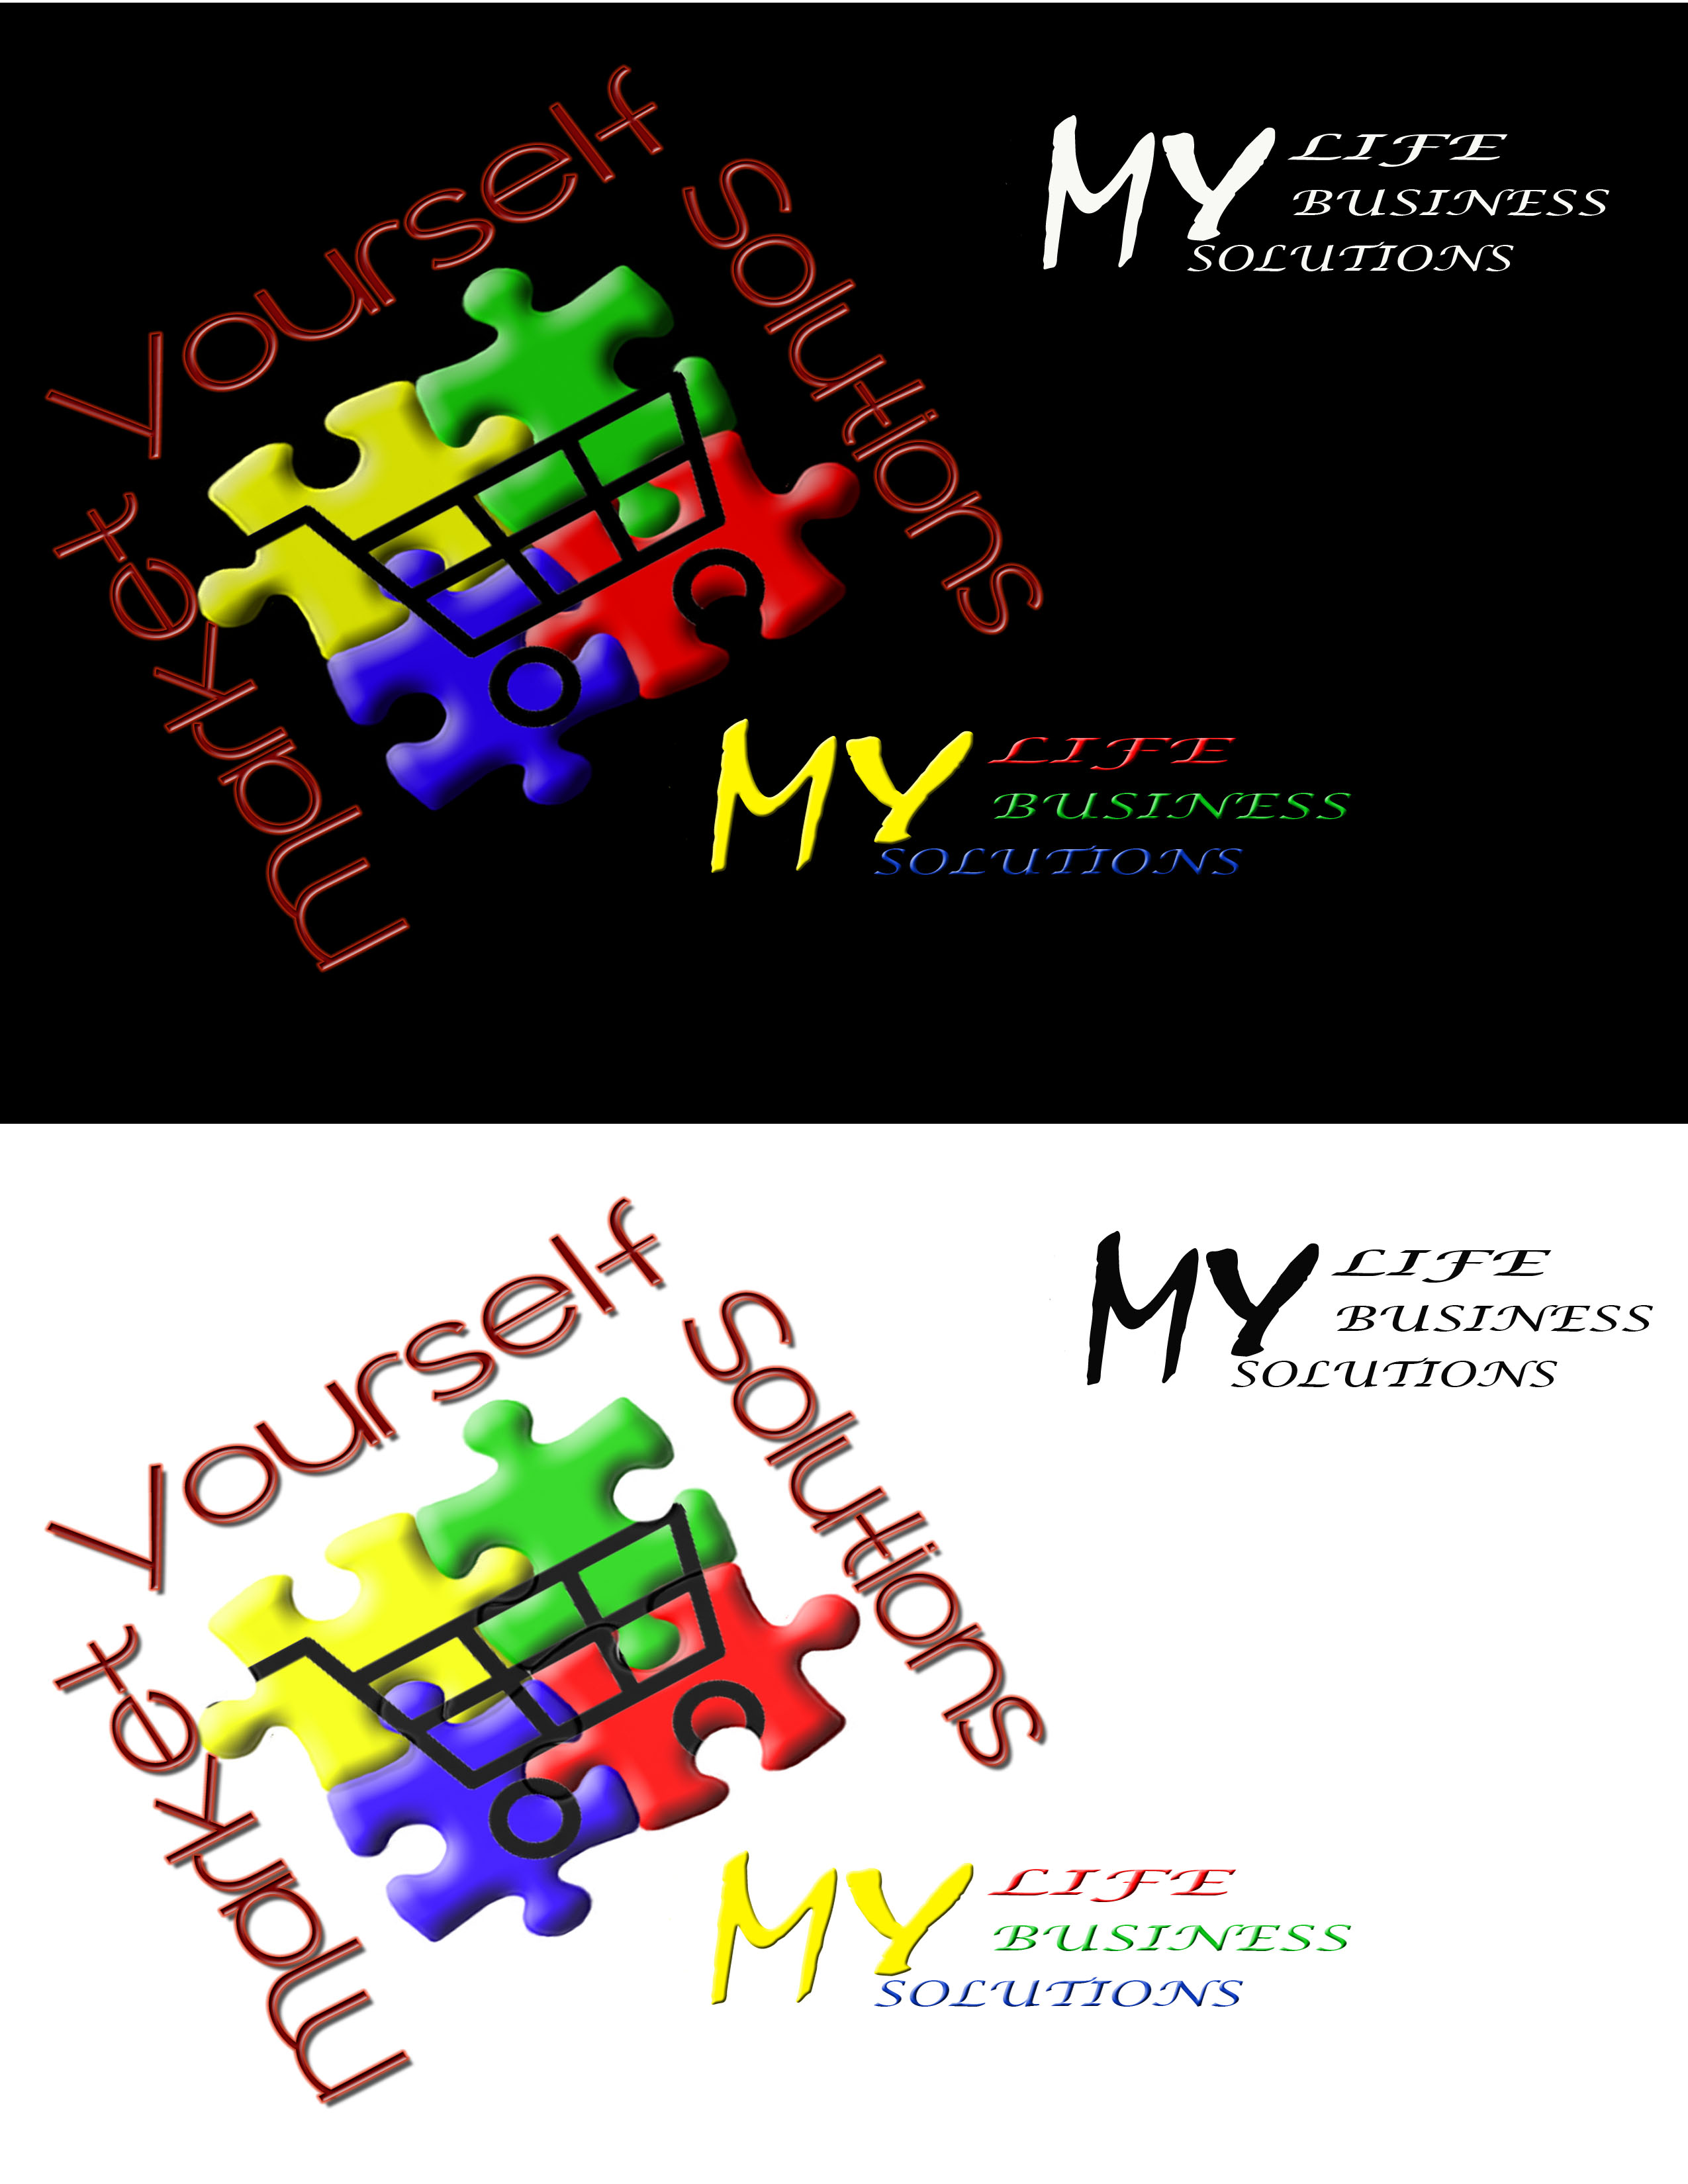 Logo Design by Arqui ACOSTA - Entry No. 63 in the Logo Design Contest Fun Logo Design for Market Yourself Solutions.